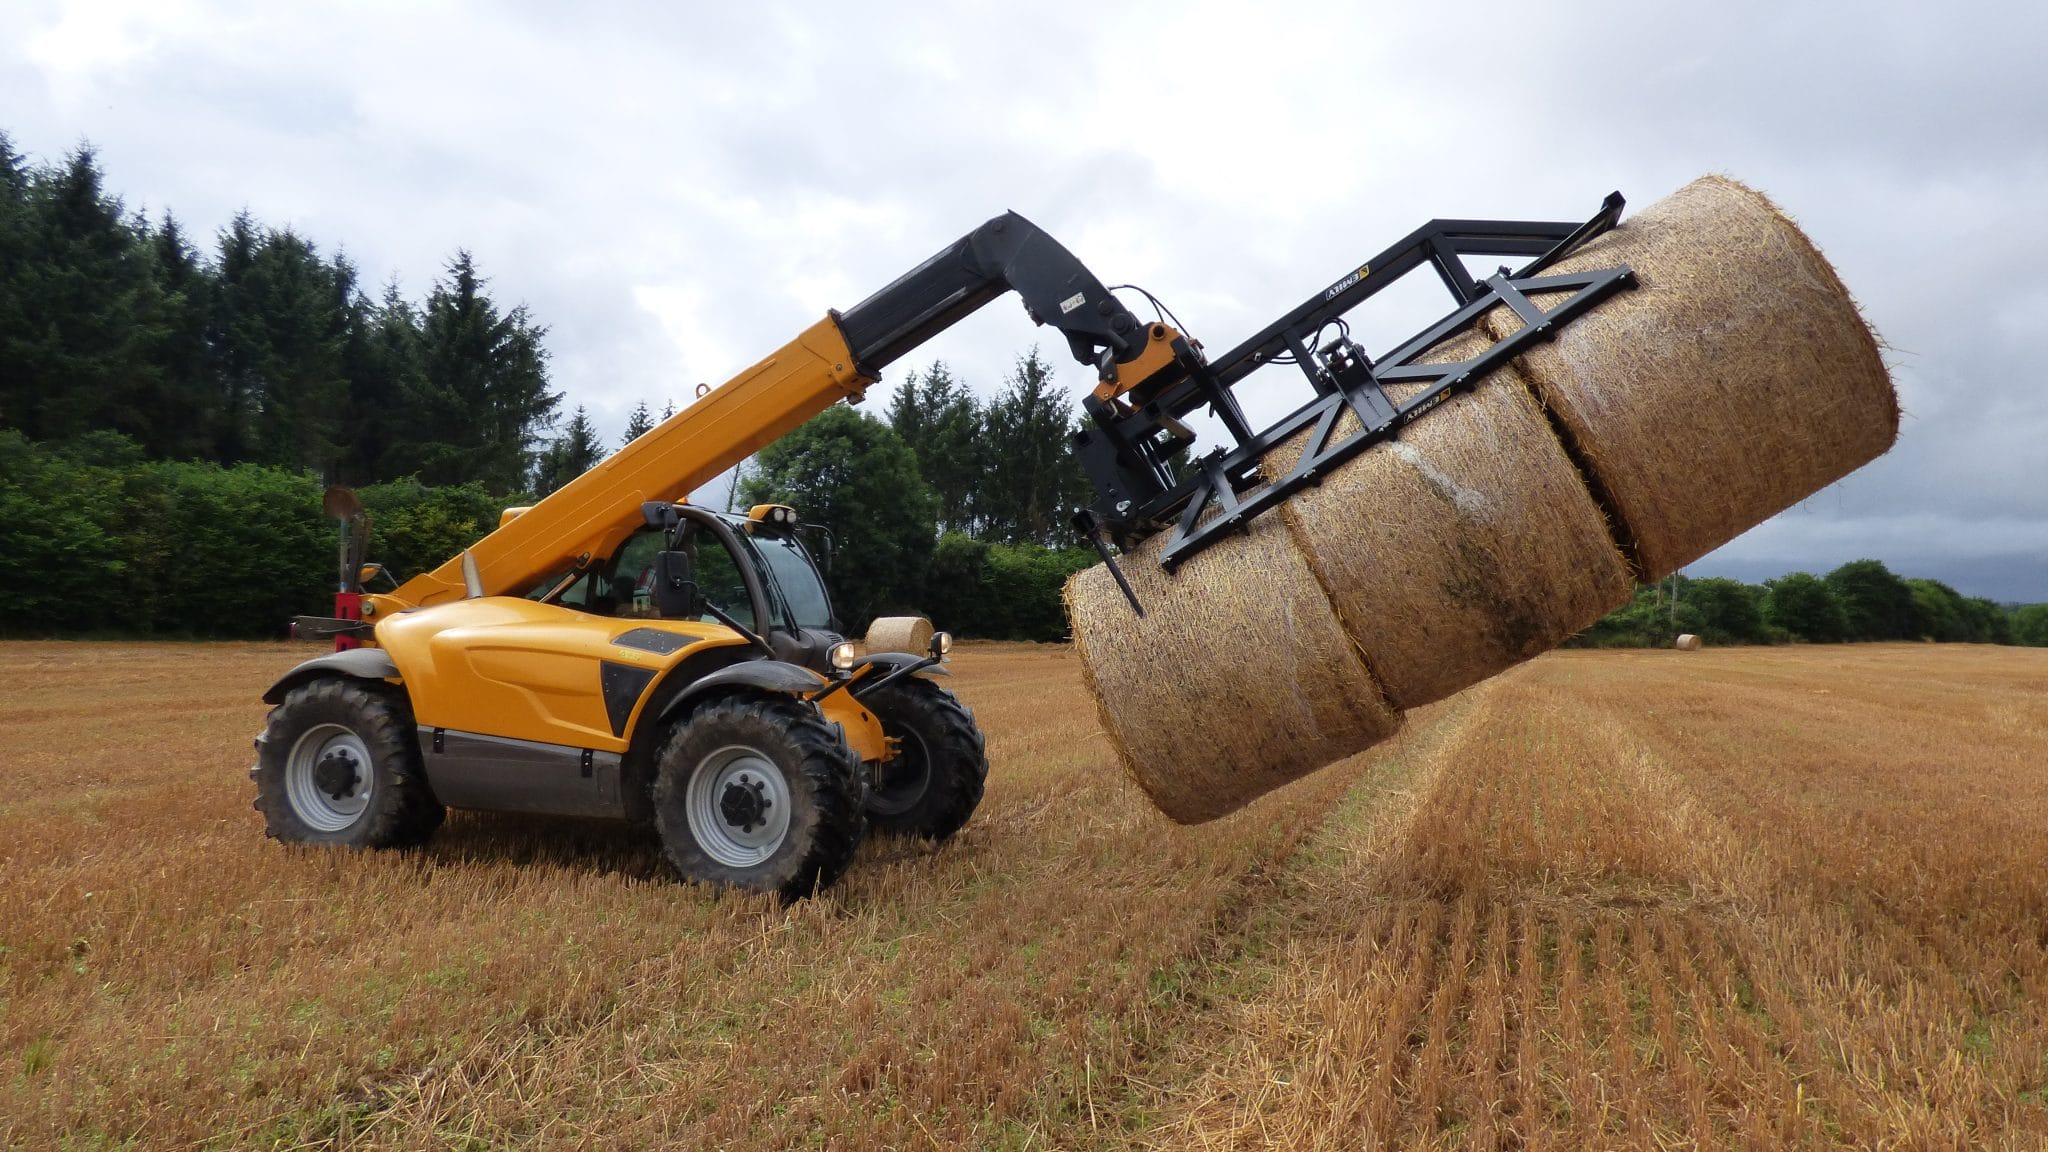 Attachment for arable crops